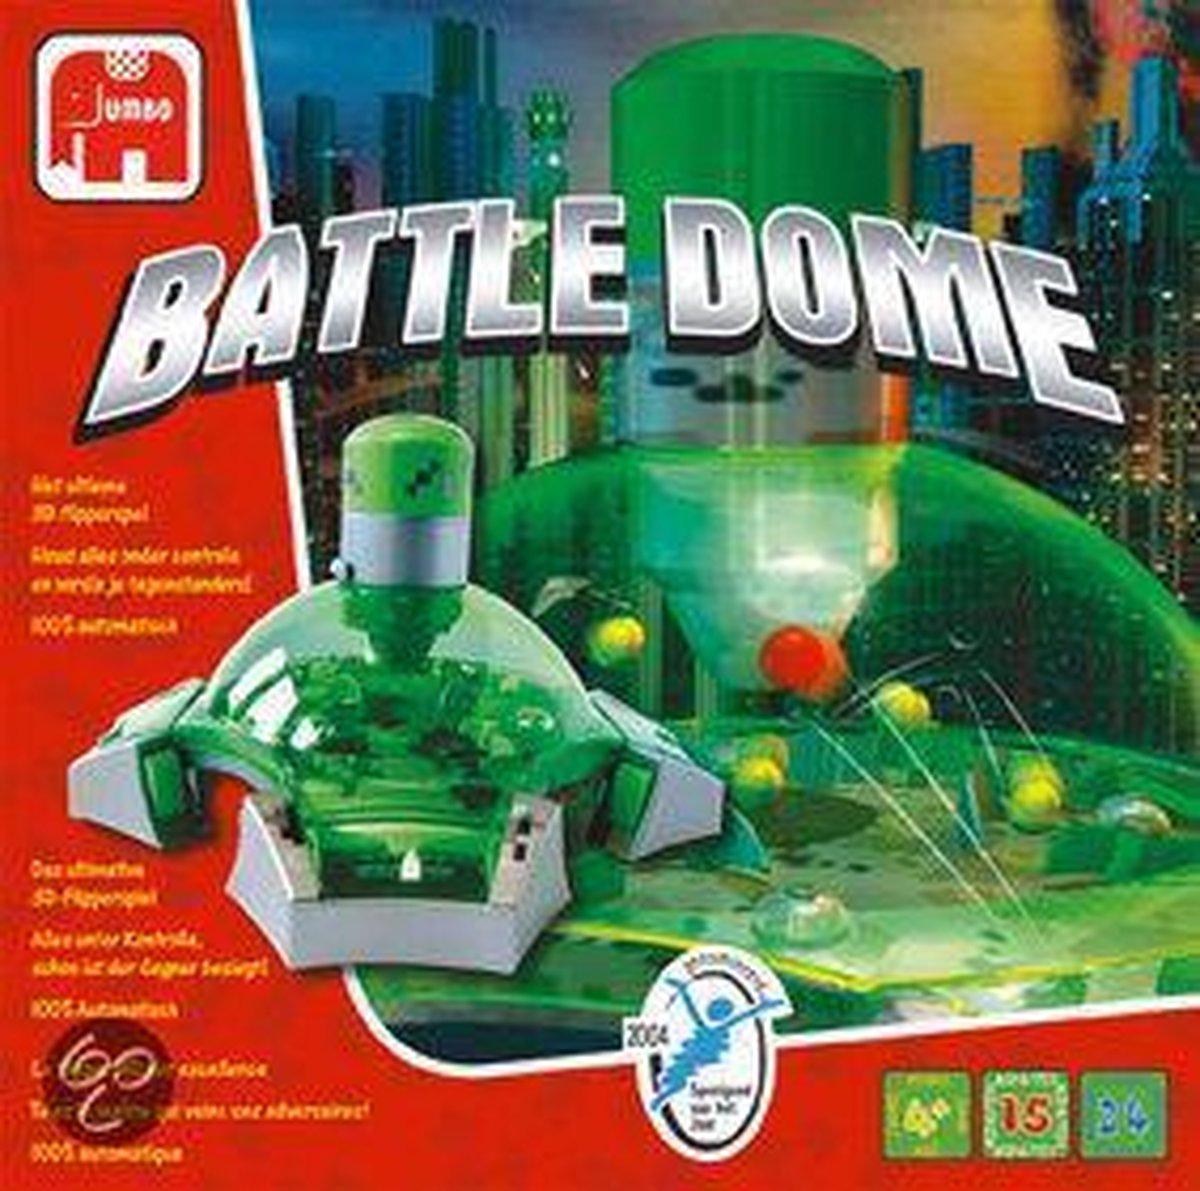 Battledome